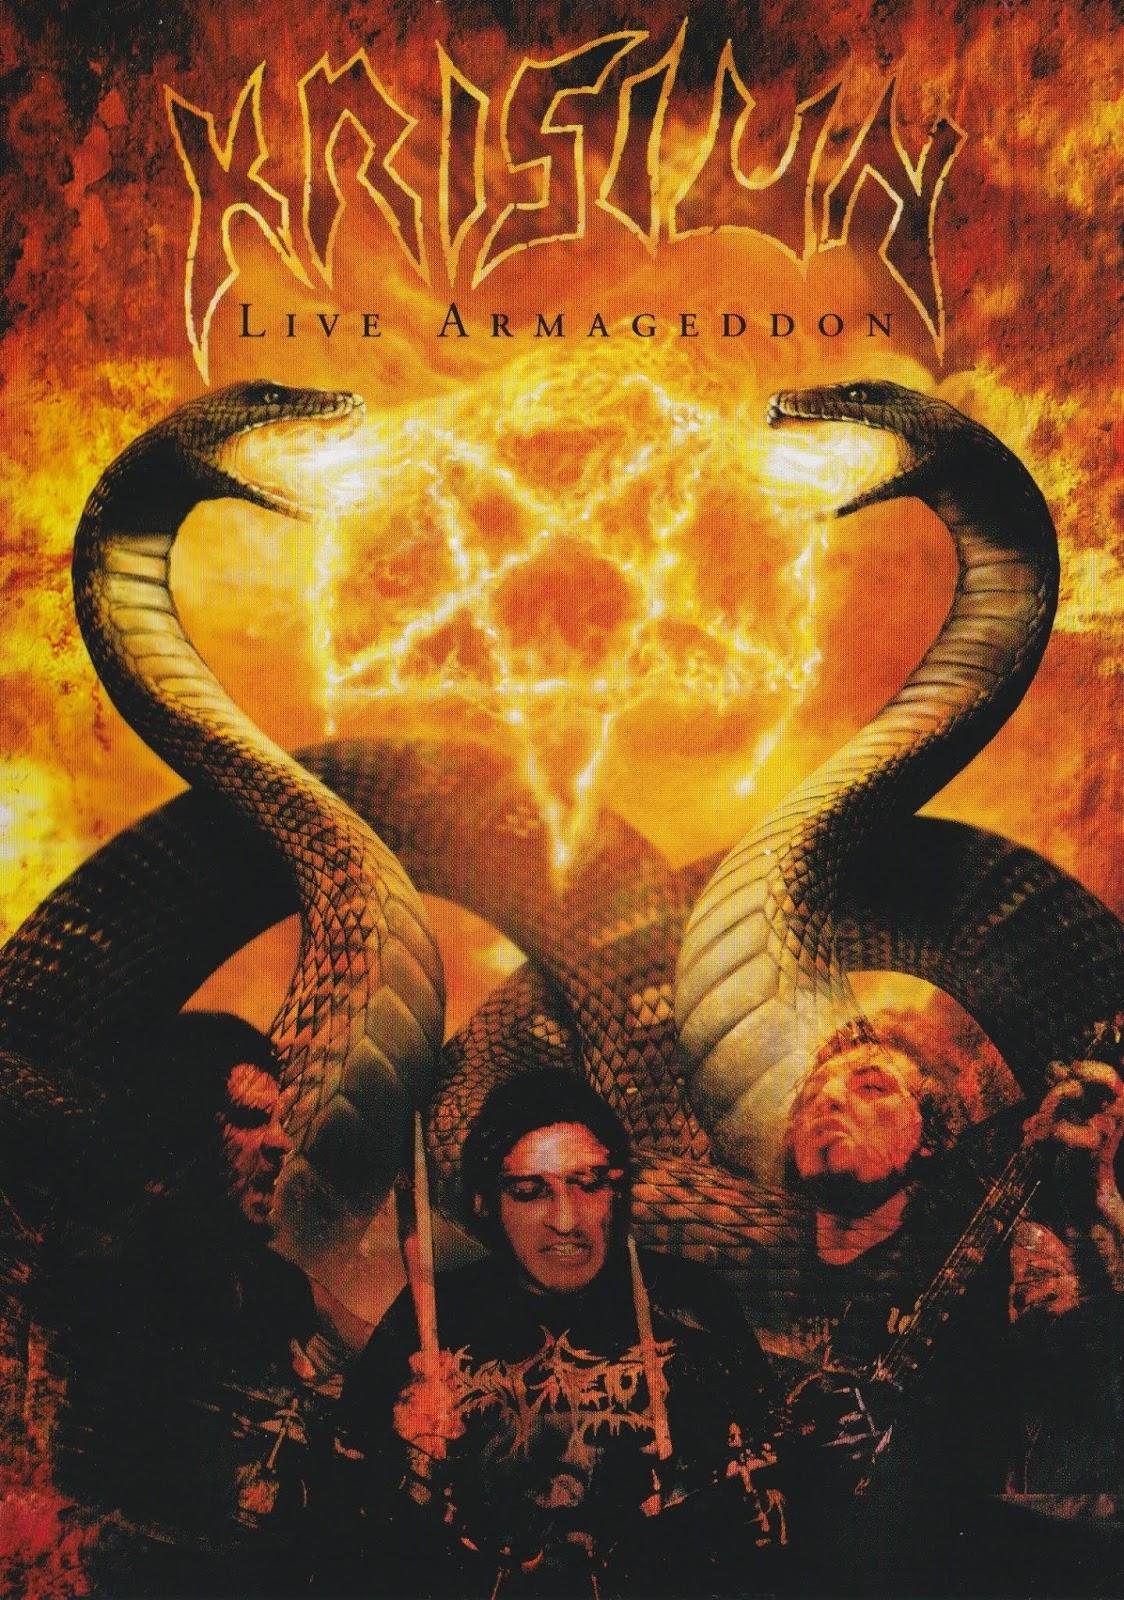 Krisiun — Live Armageddon DVD (2005)